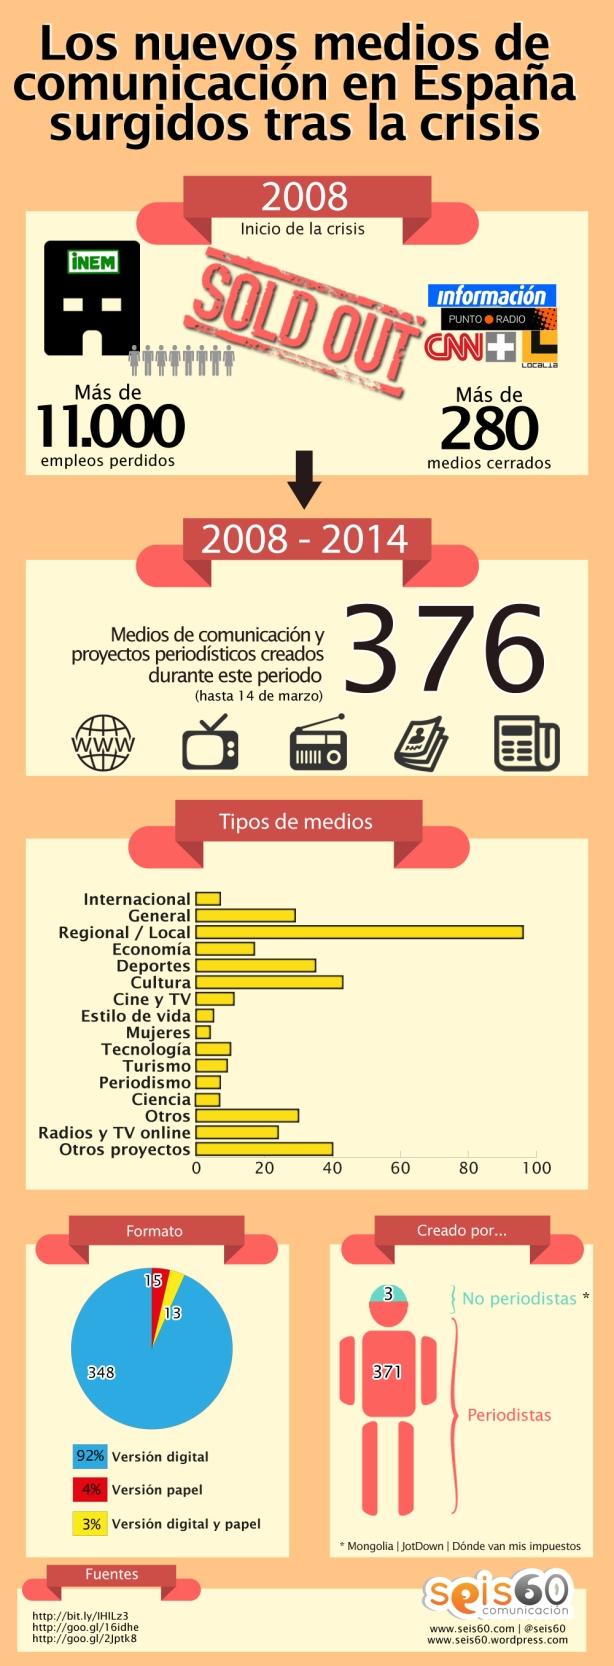 Infografia-medios-comunicacion-crisis